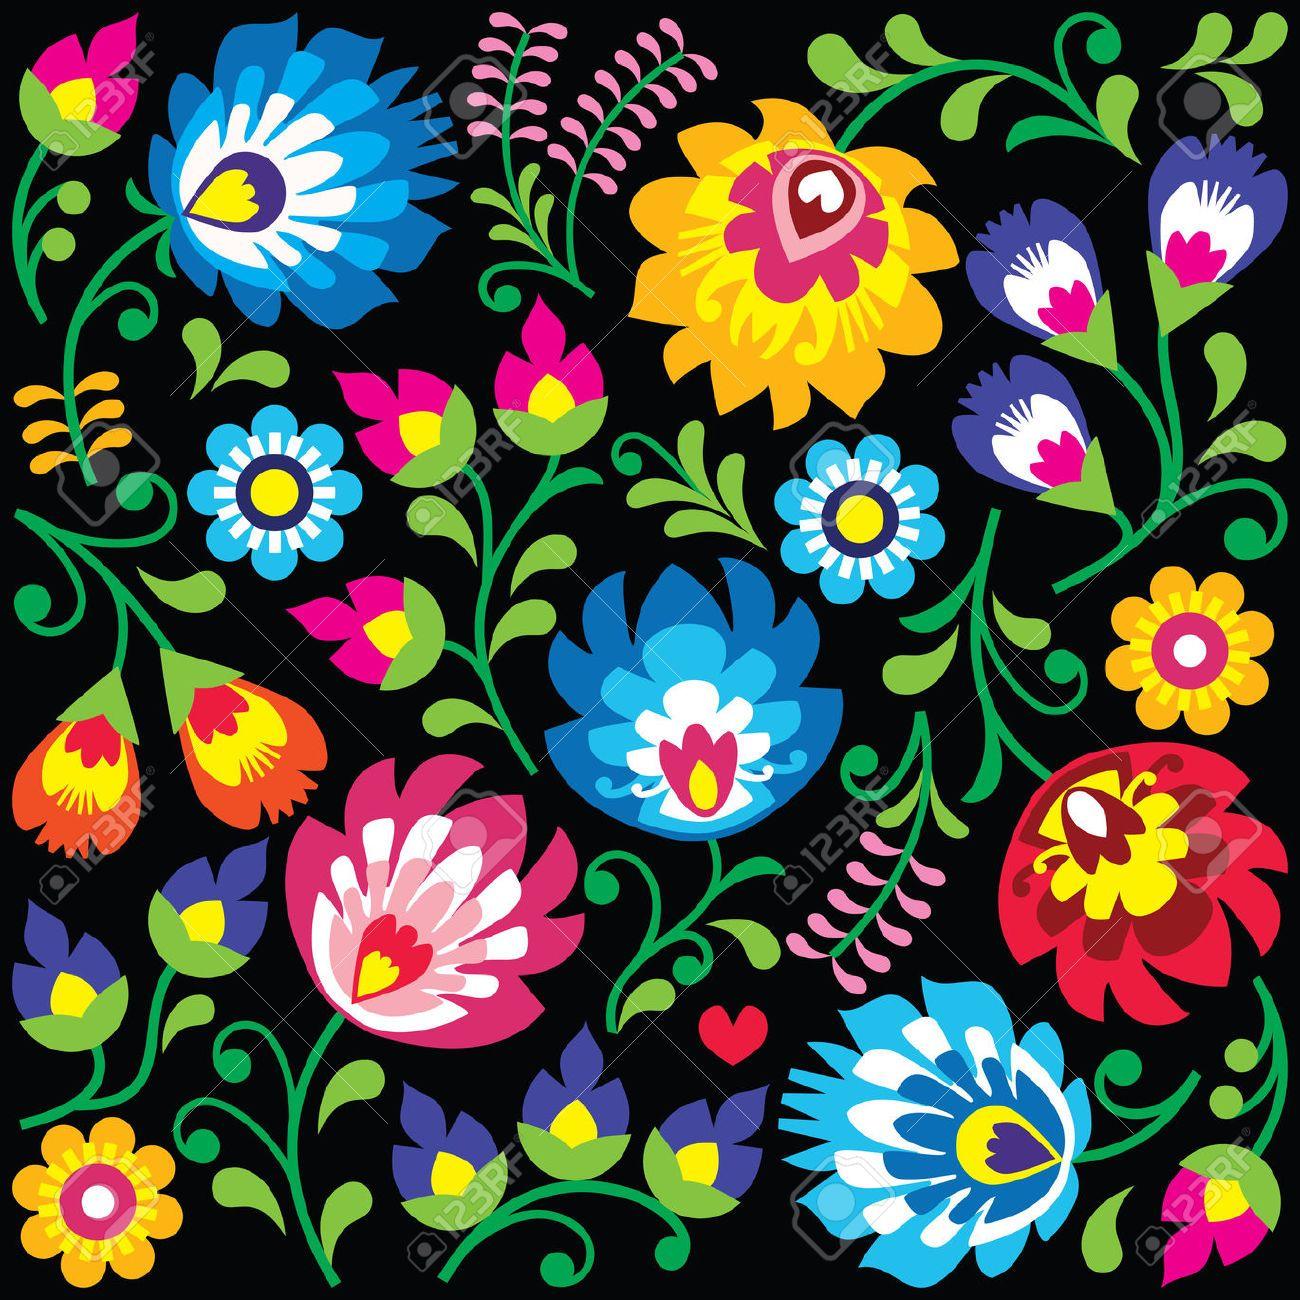 Wycinanki clipart image free library Stock Vector | Art | Polish folk art, Pattern art, Folk ... image free library